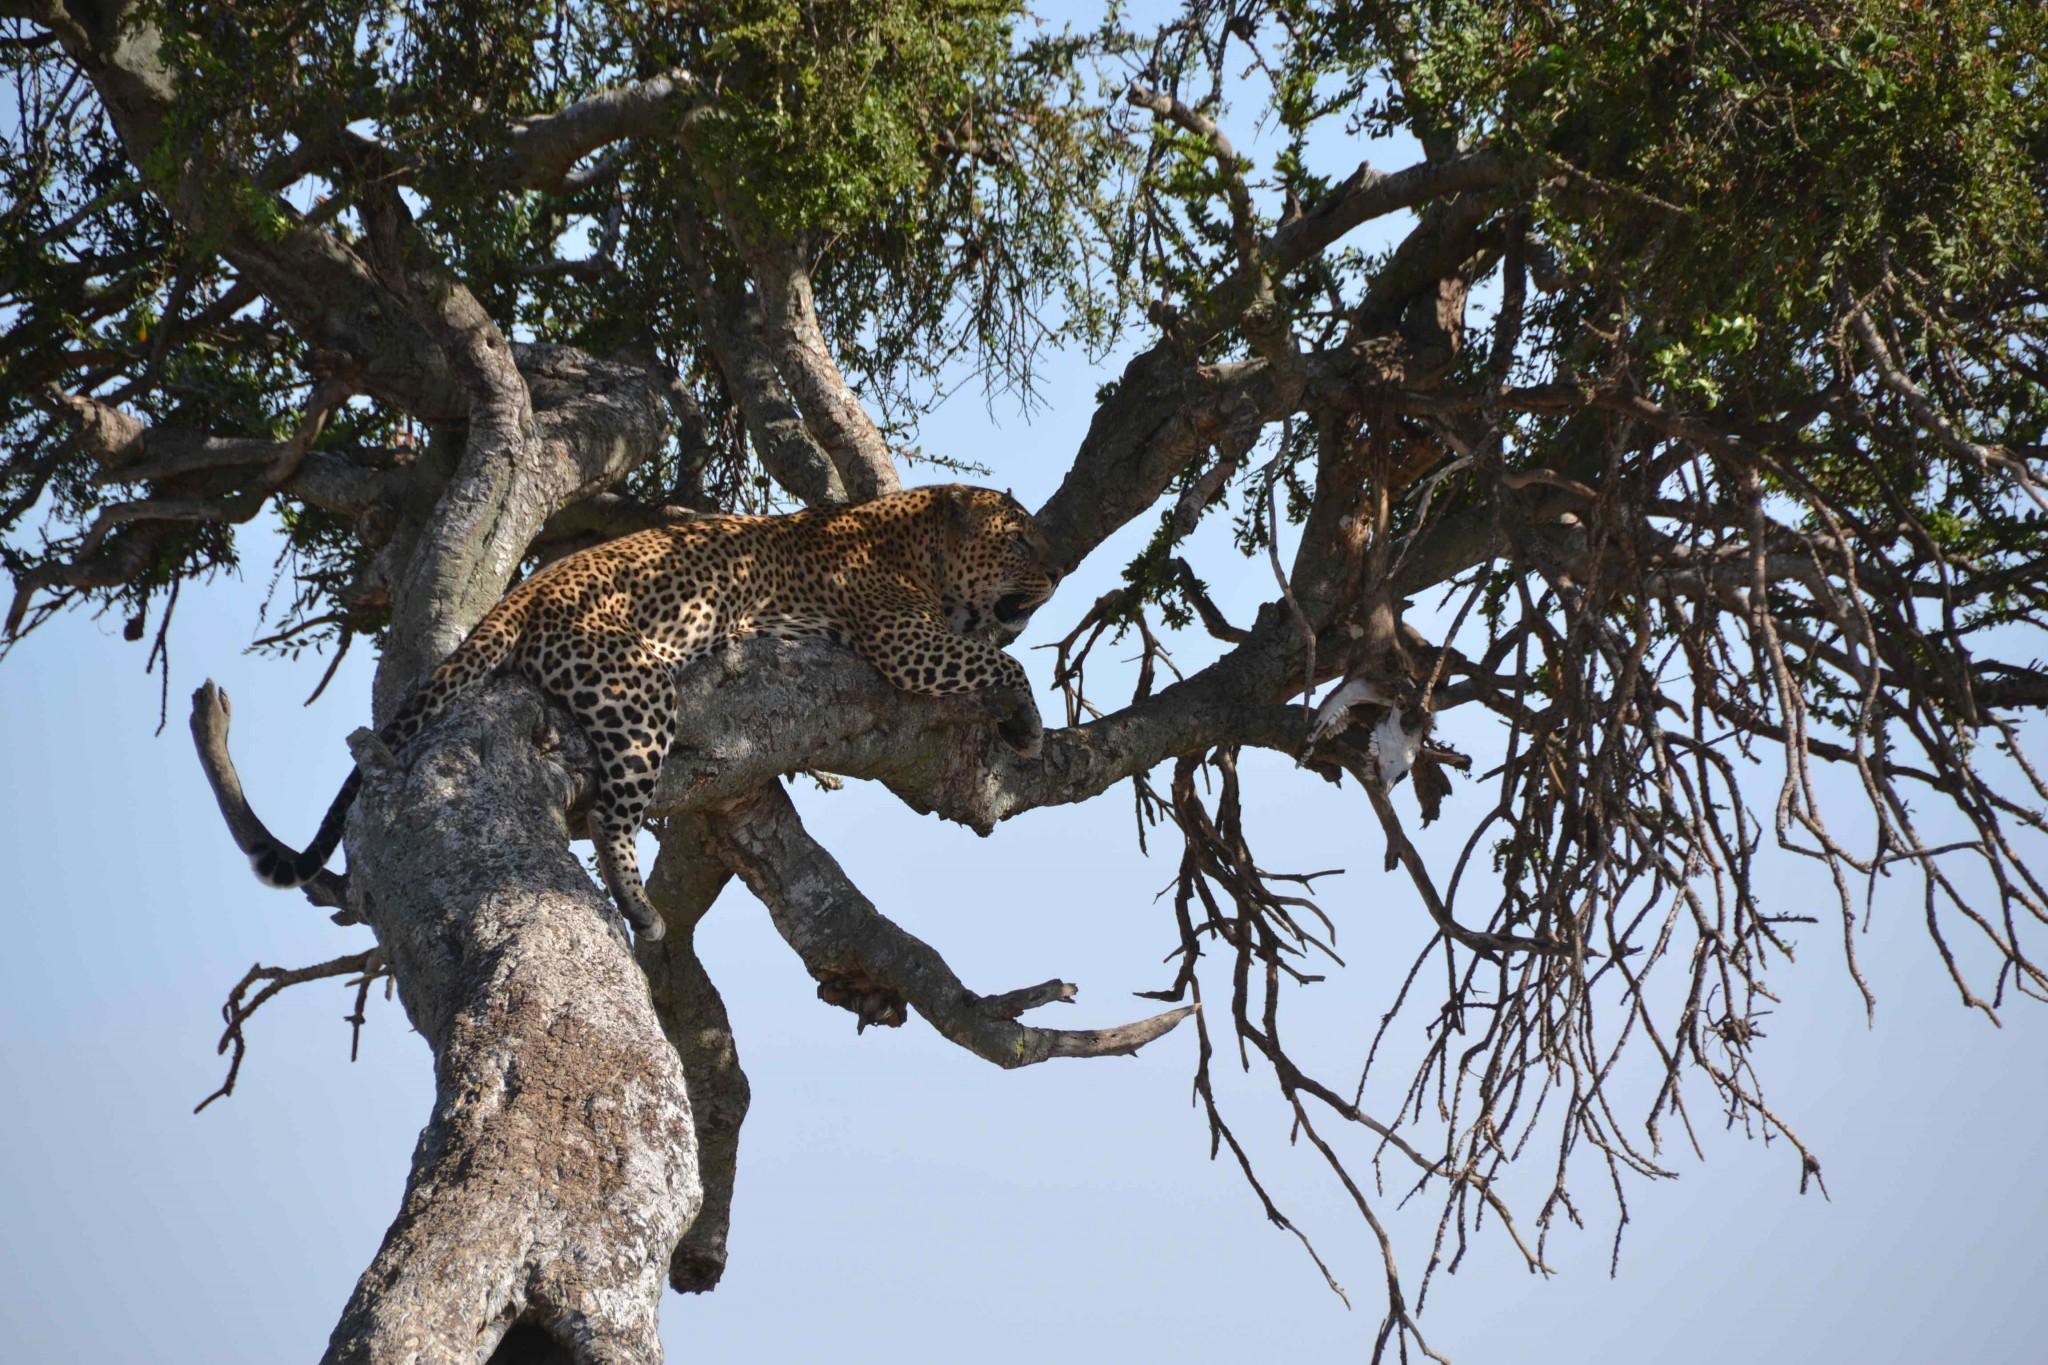 Kenia Safari Reise Leopard im Baum - Keniaurlaub